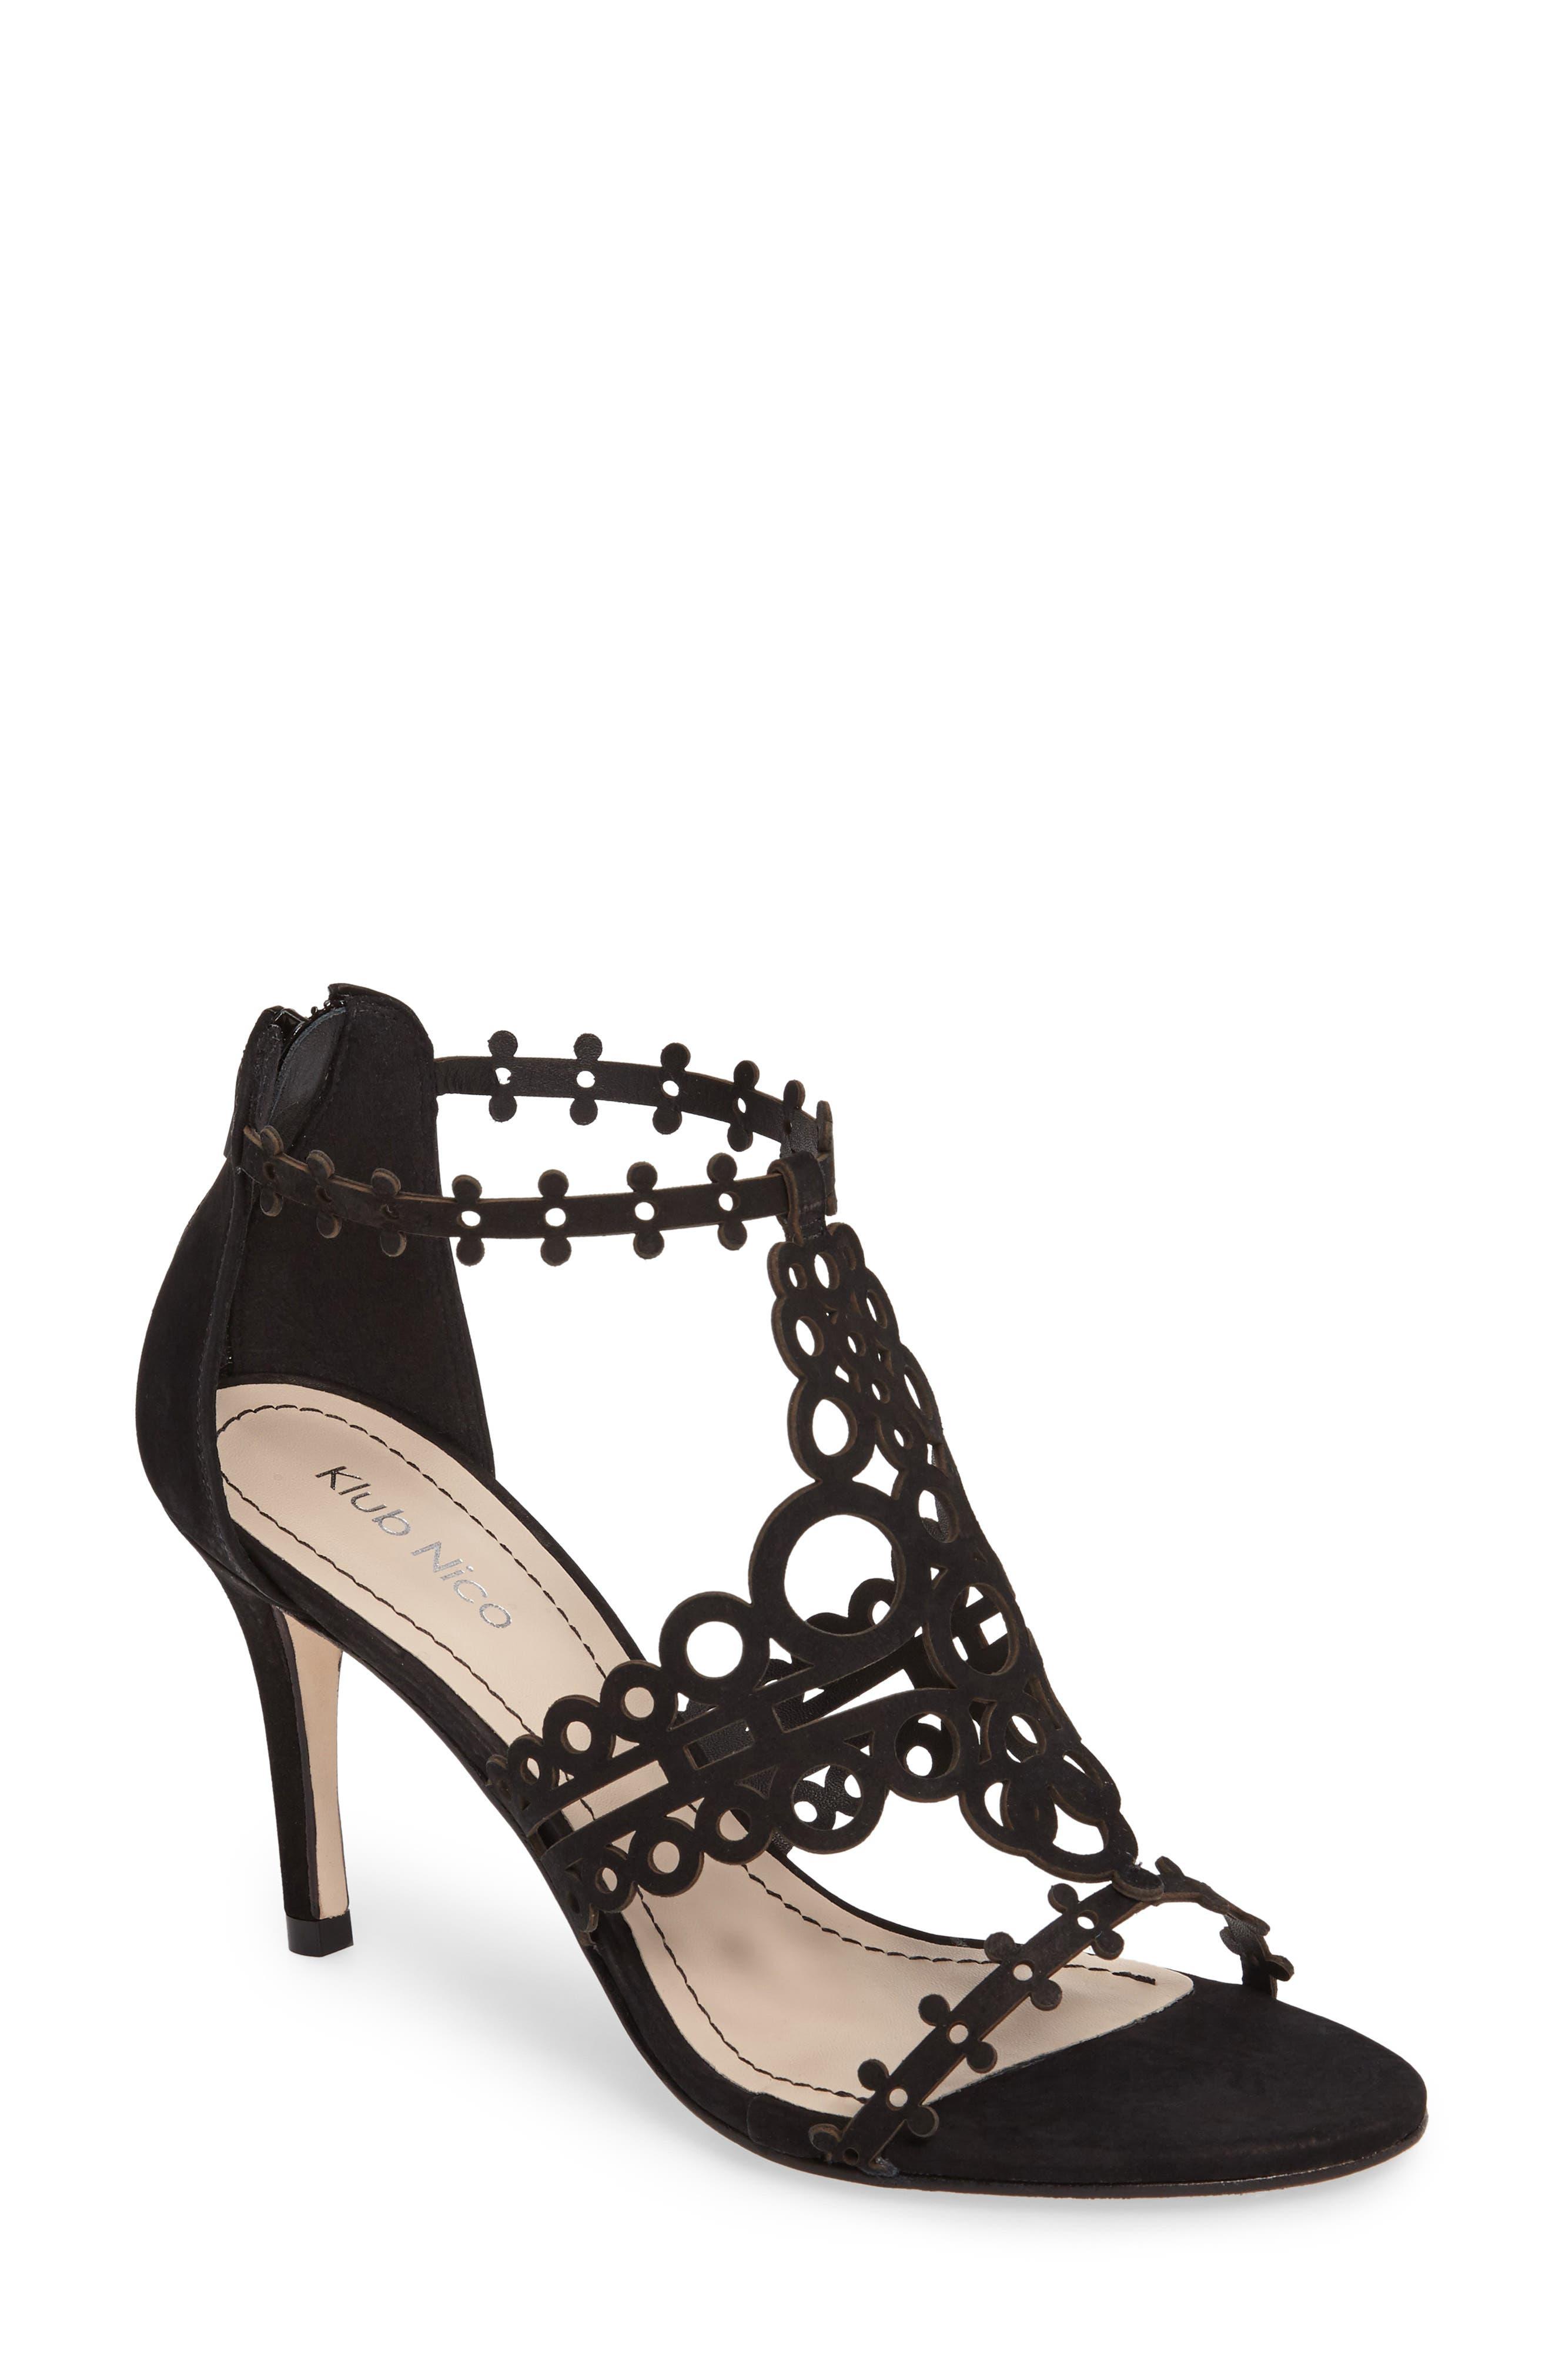 Main Image - Klub Nico 'Antonia' Laser Cut T-Strap Sandal (Women)